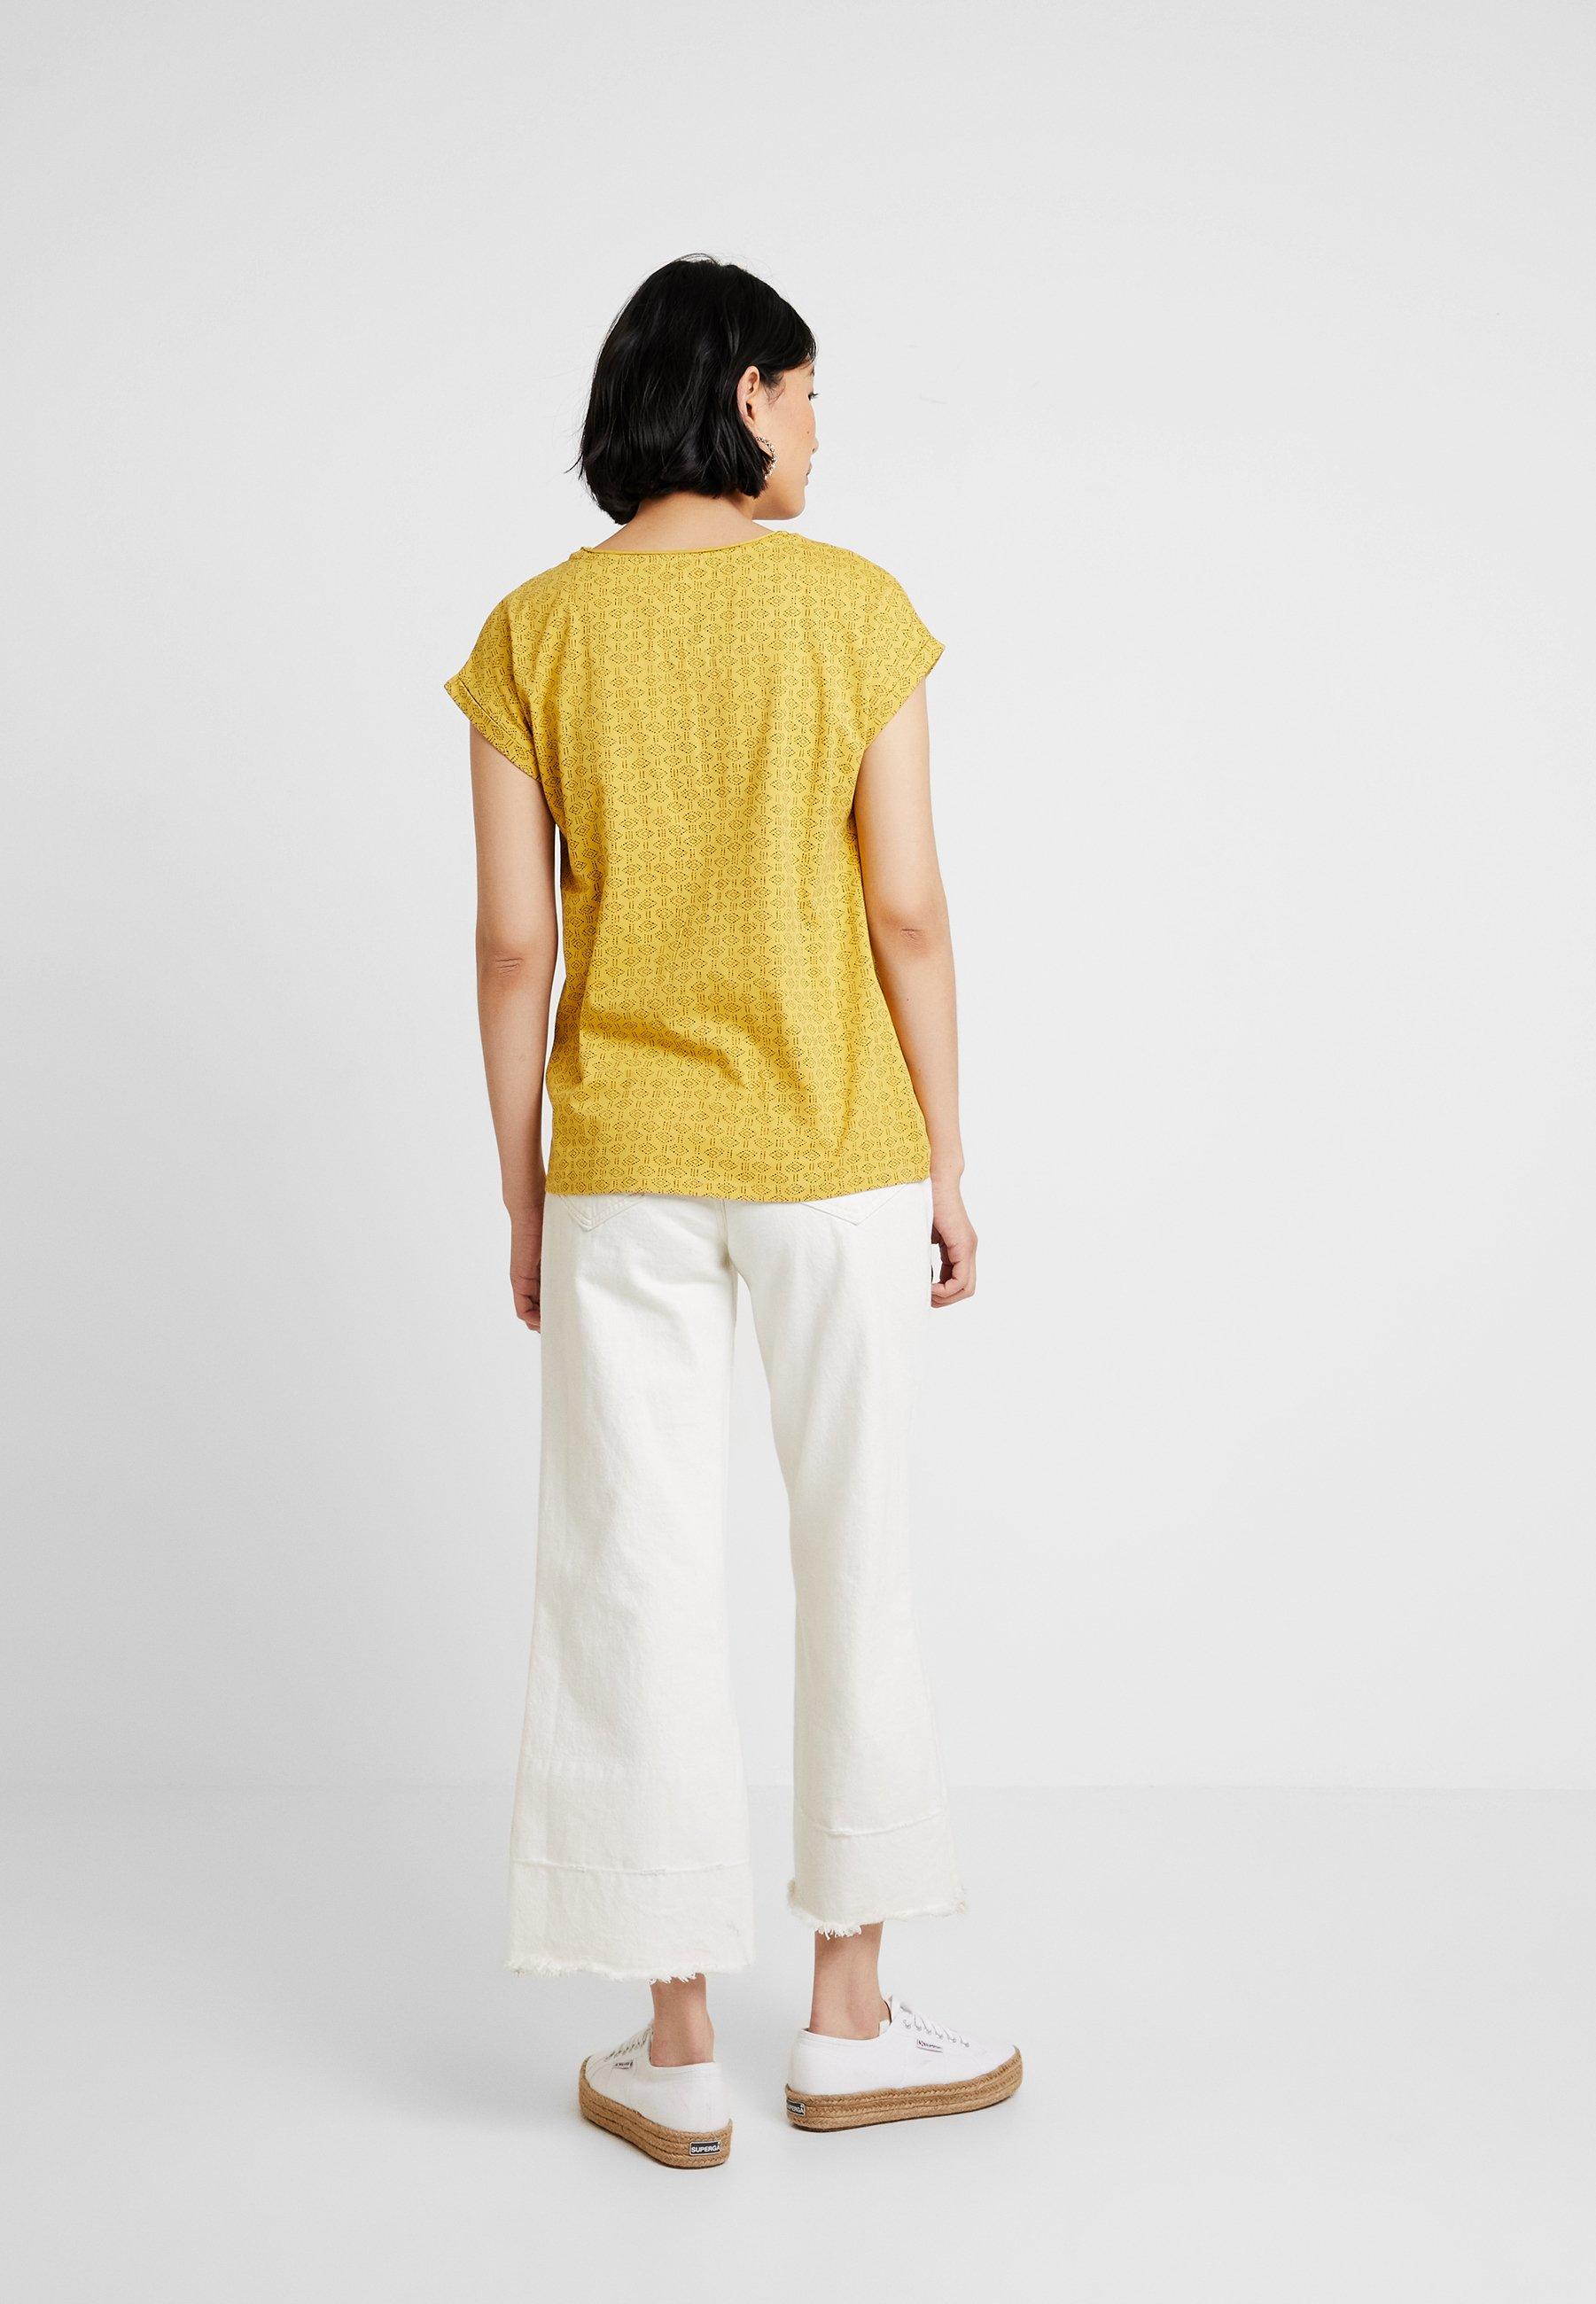 Brass Yellow shirt Stampa Pattern Con TeeT Esprit 3AR4q5jL